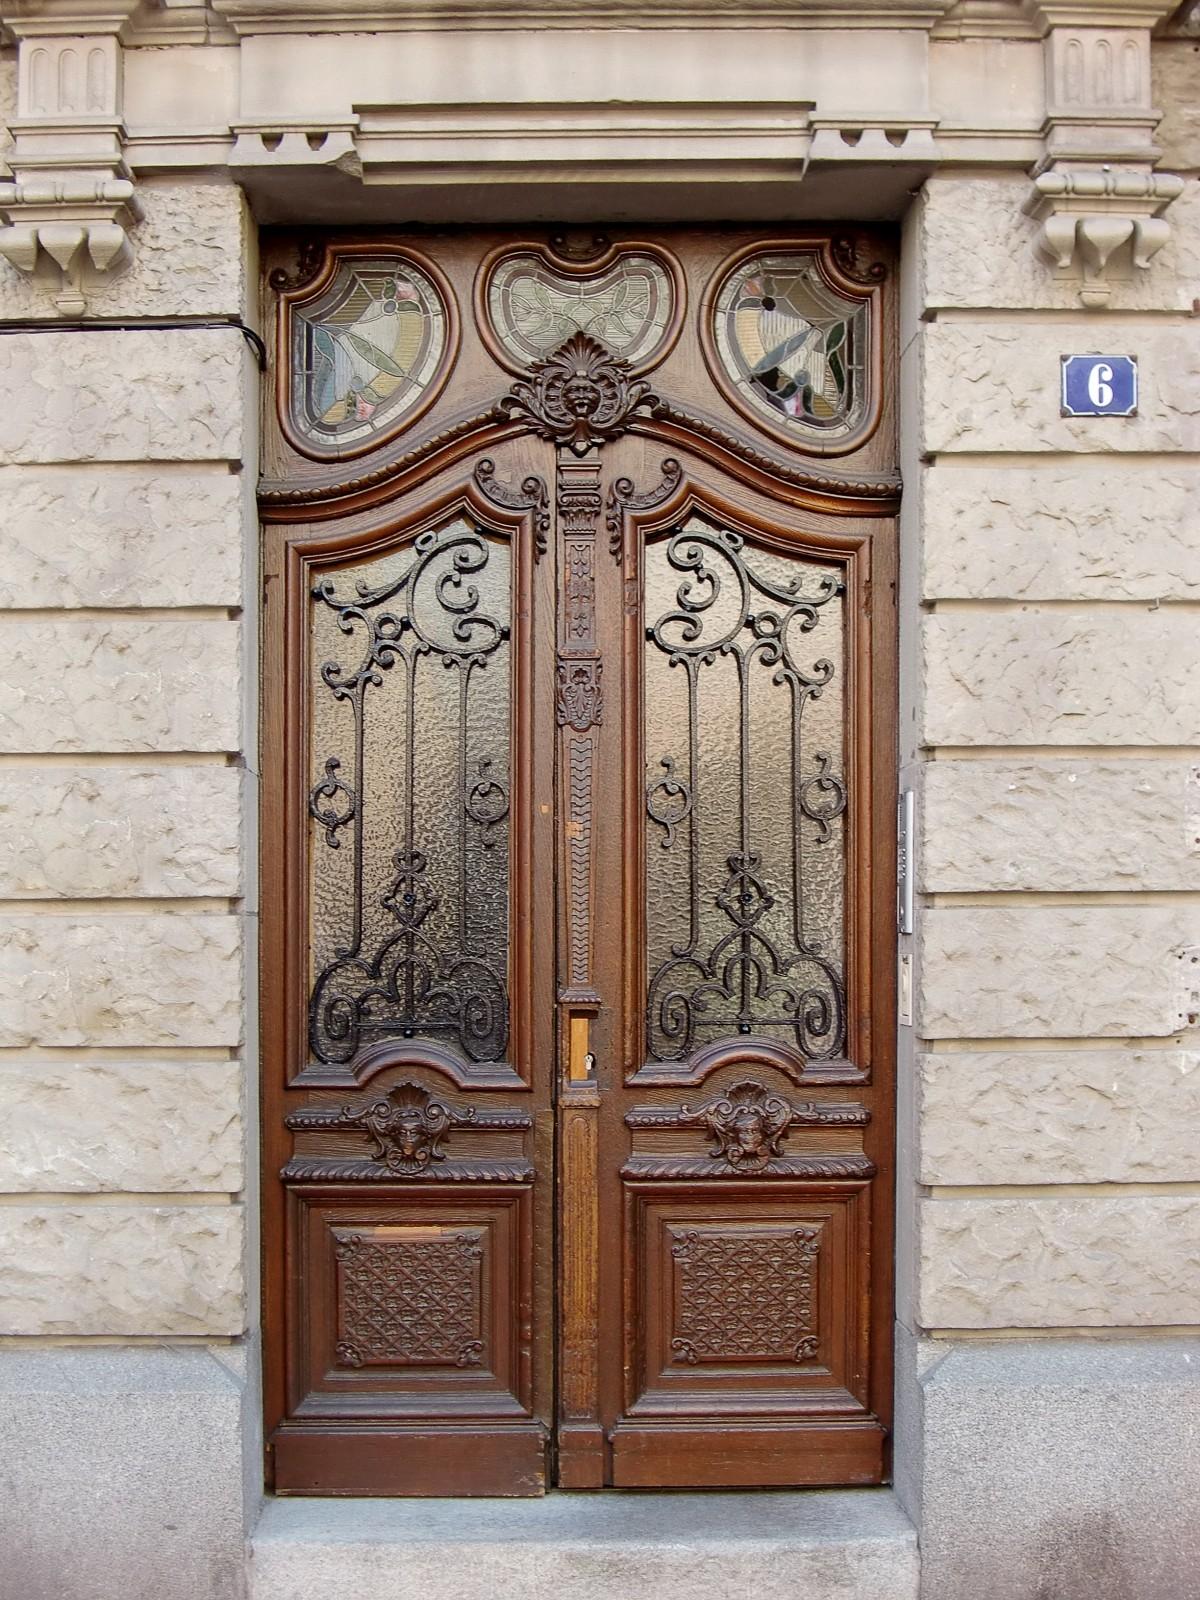 Fotos gratis ventana antiguo fachada mueble port n for Porton madera antiguo